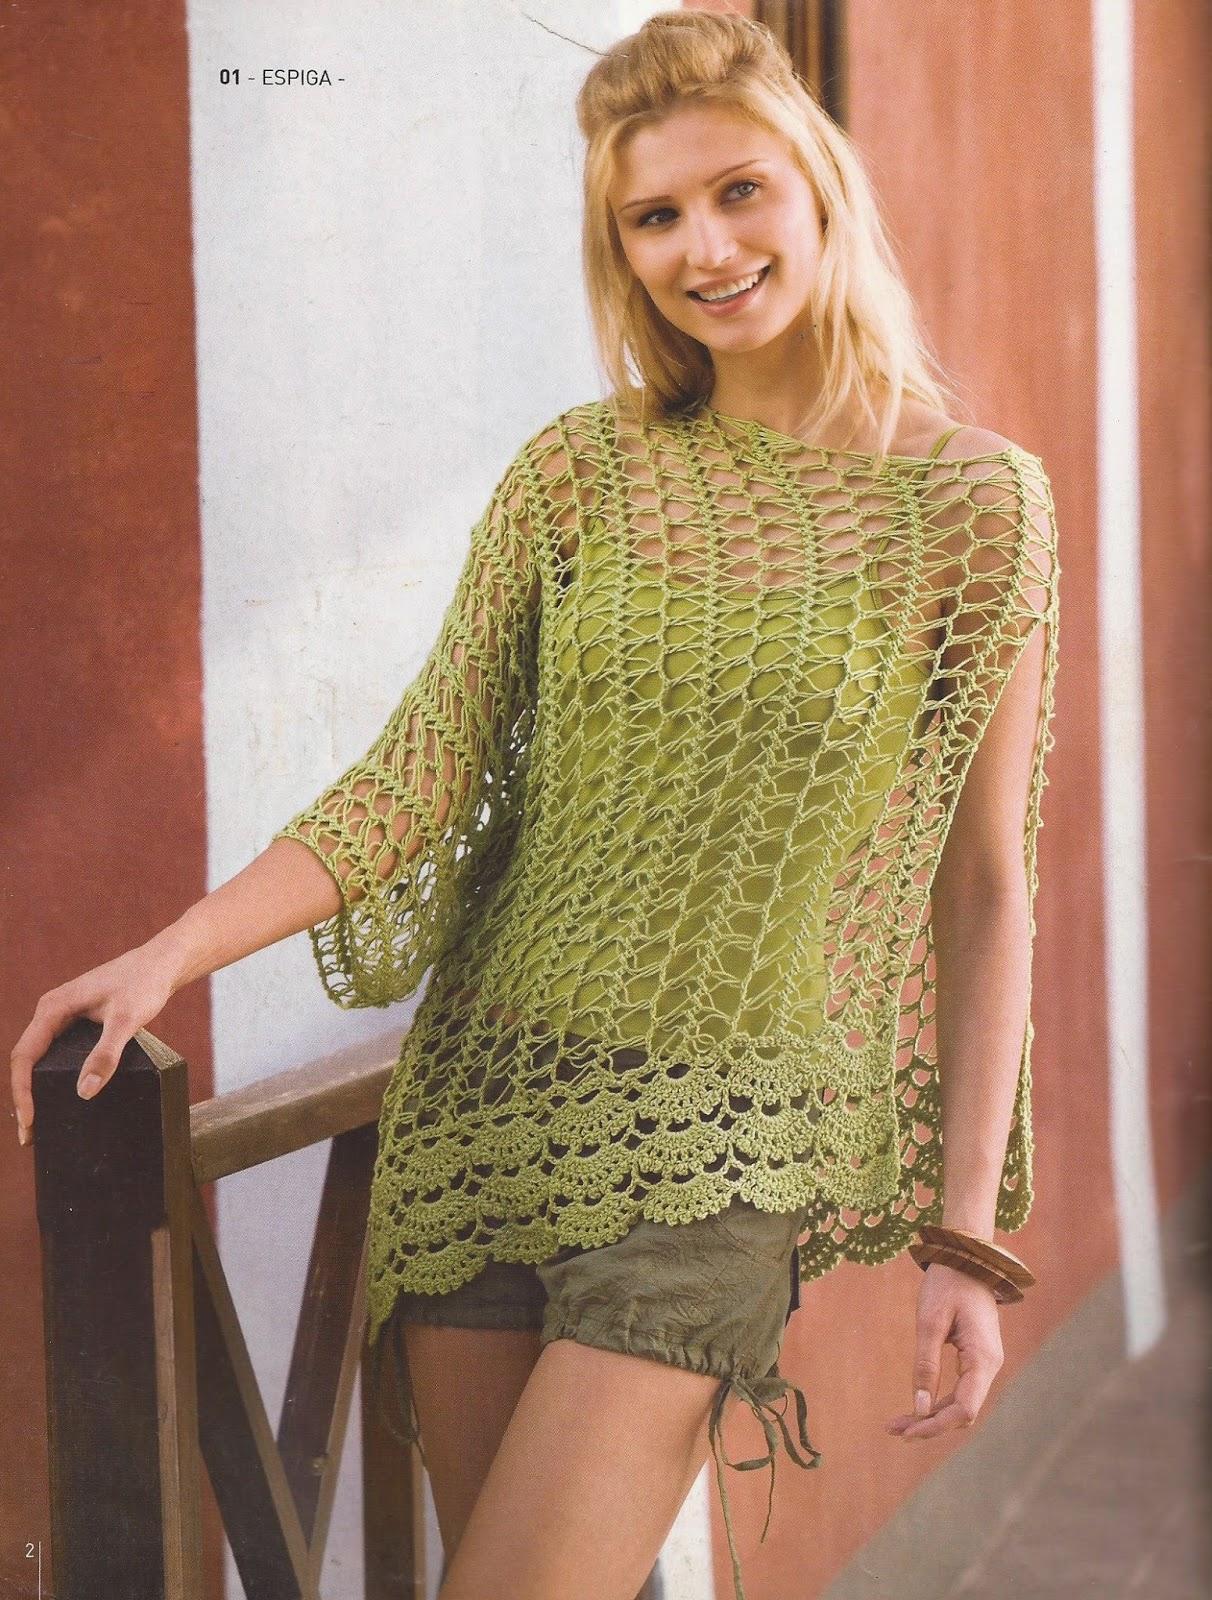 Crochet ganchillo patrones graficos chal tejido a tattoo - Patrones de ganchillo ...